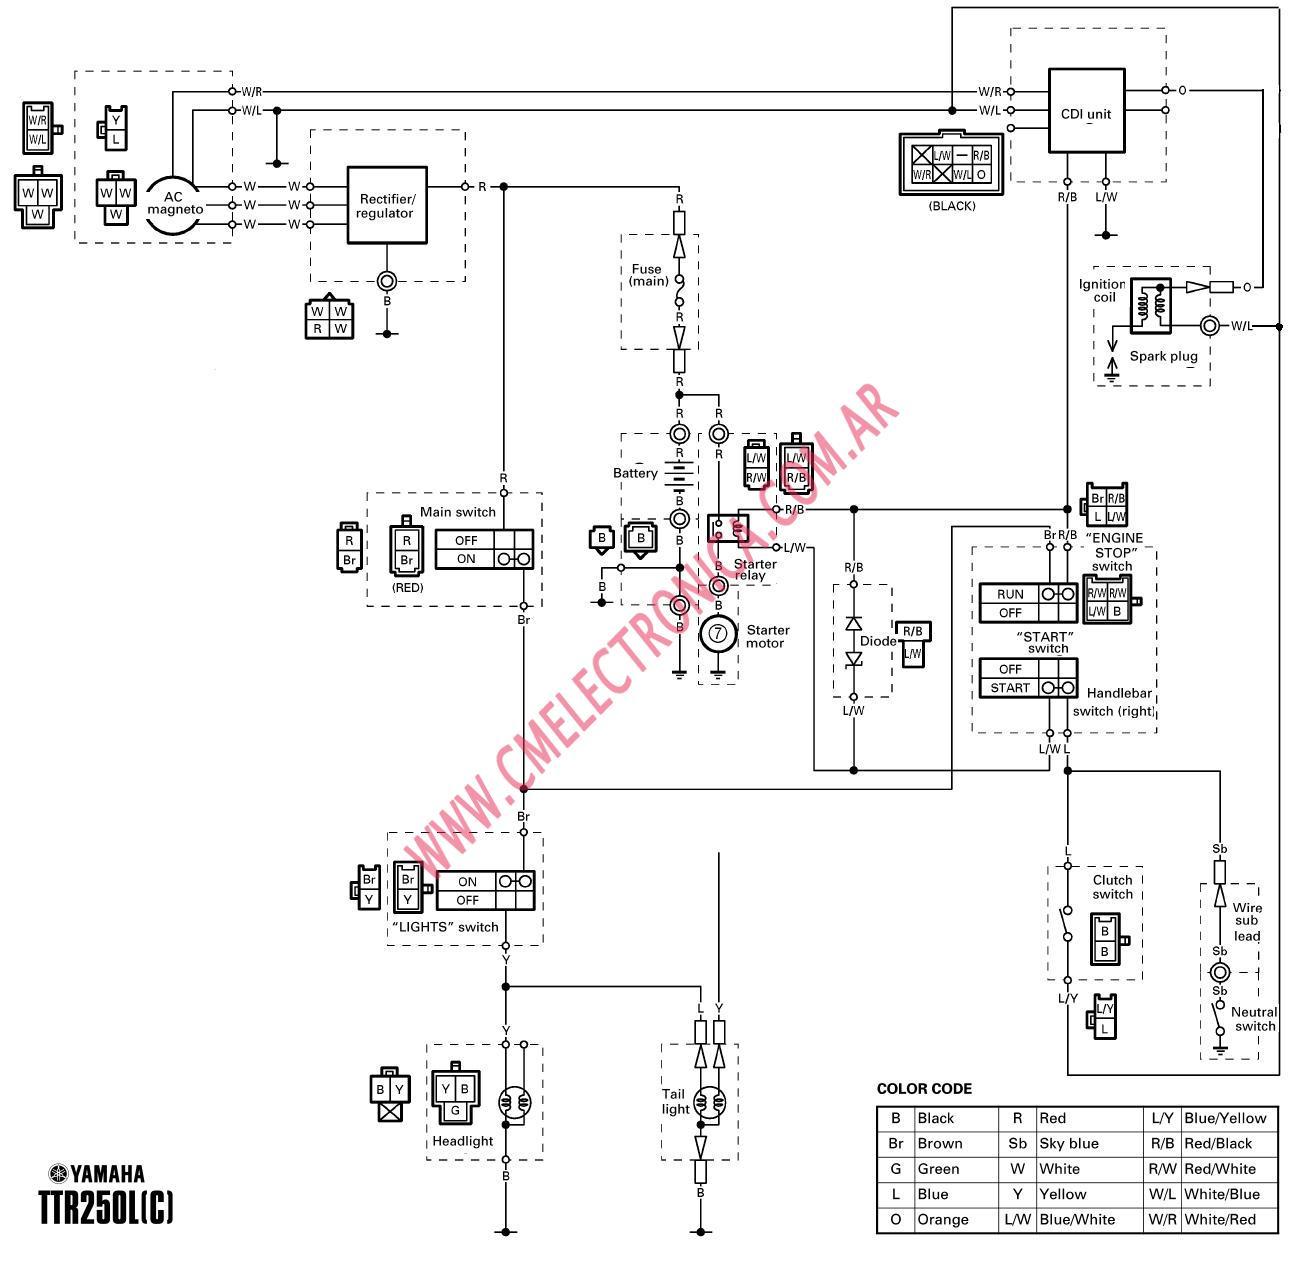 yamaha atv cdi wiring diagrams